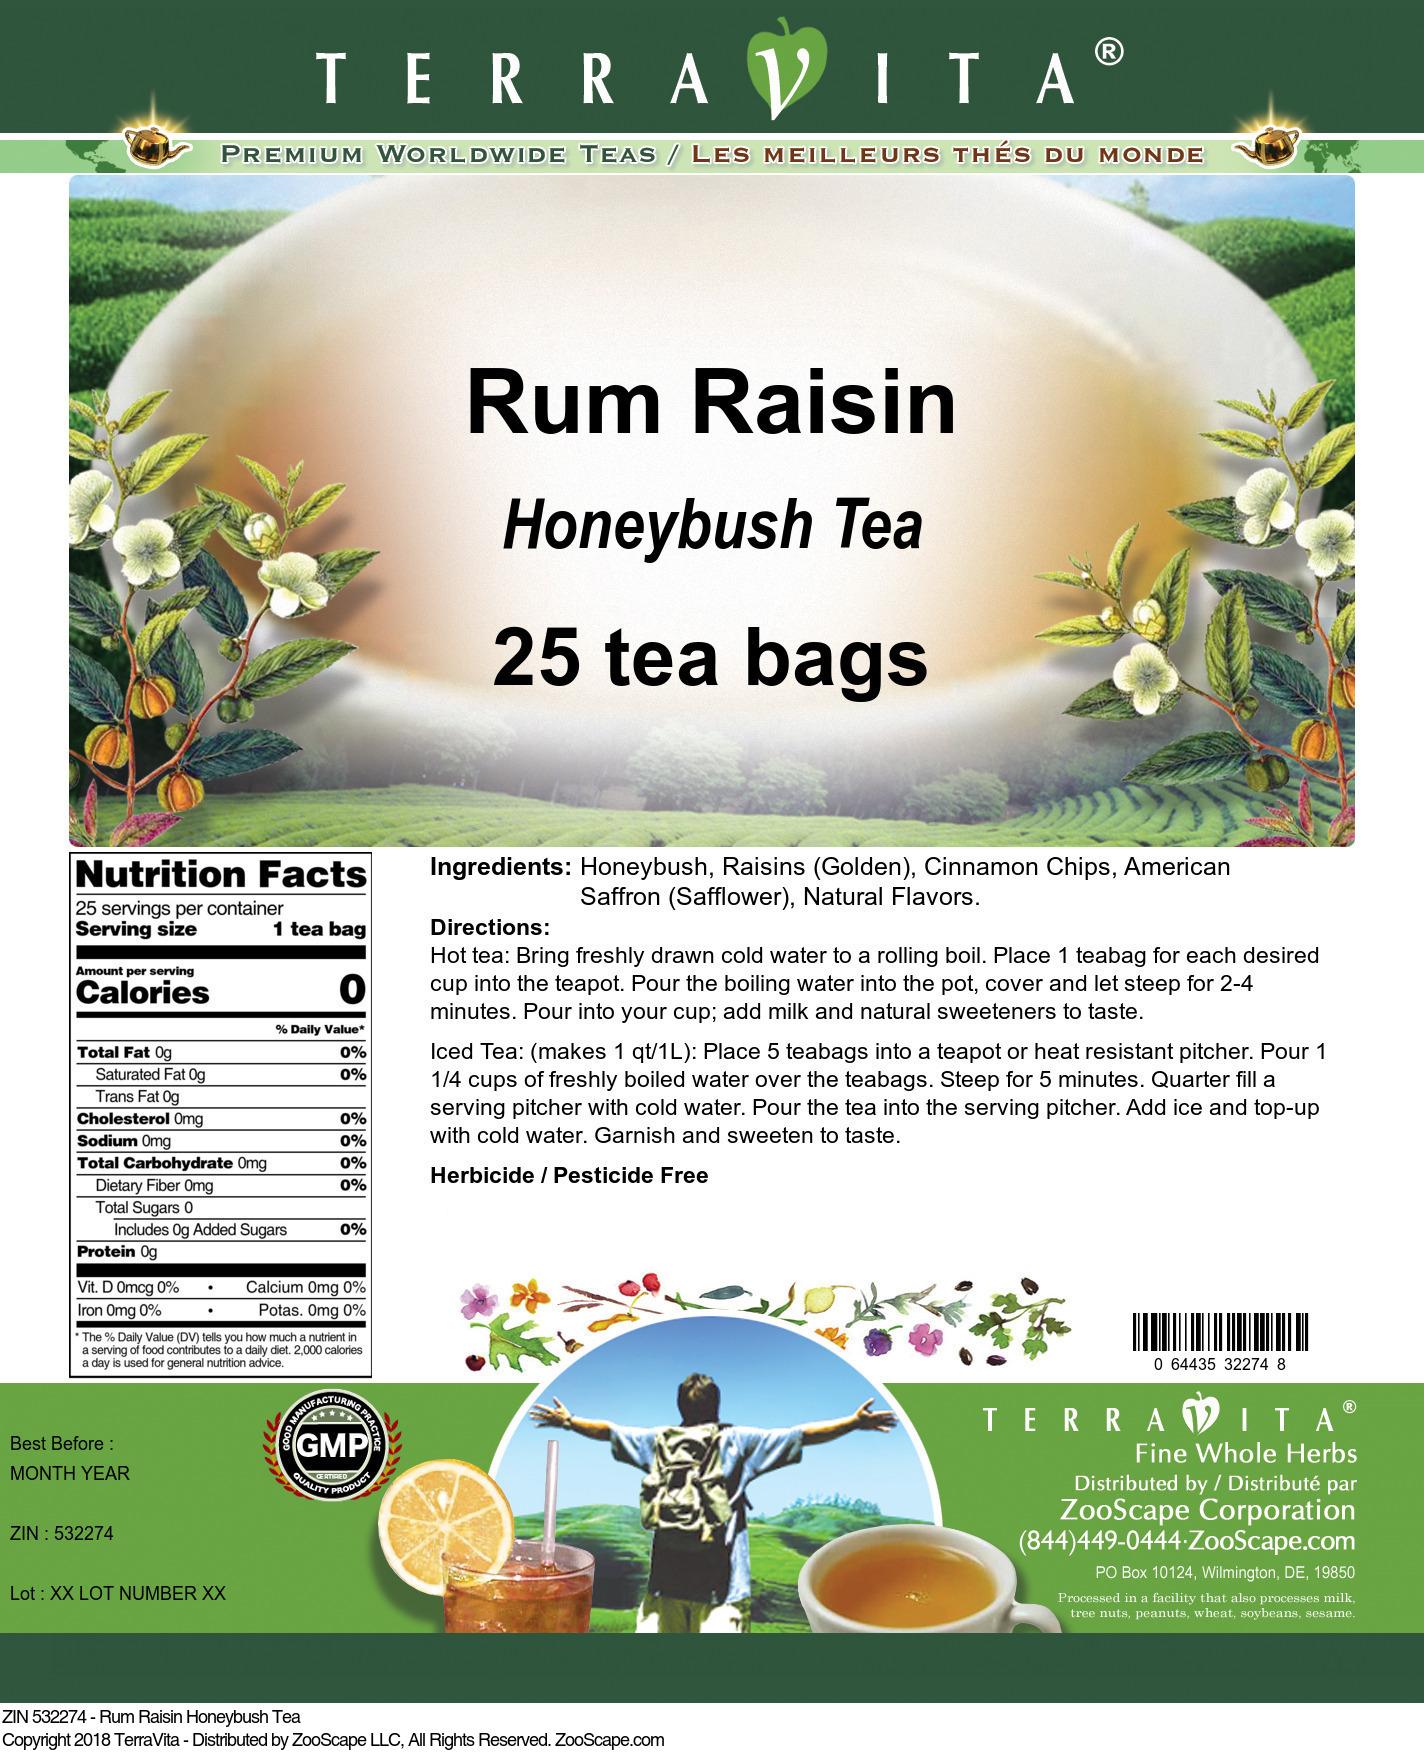 Rum Raisin Honeybush Tea